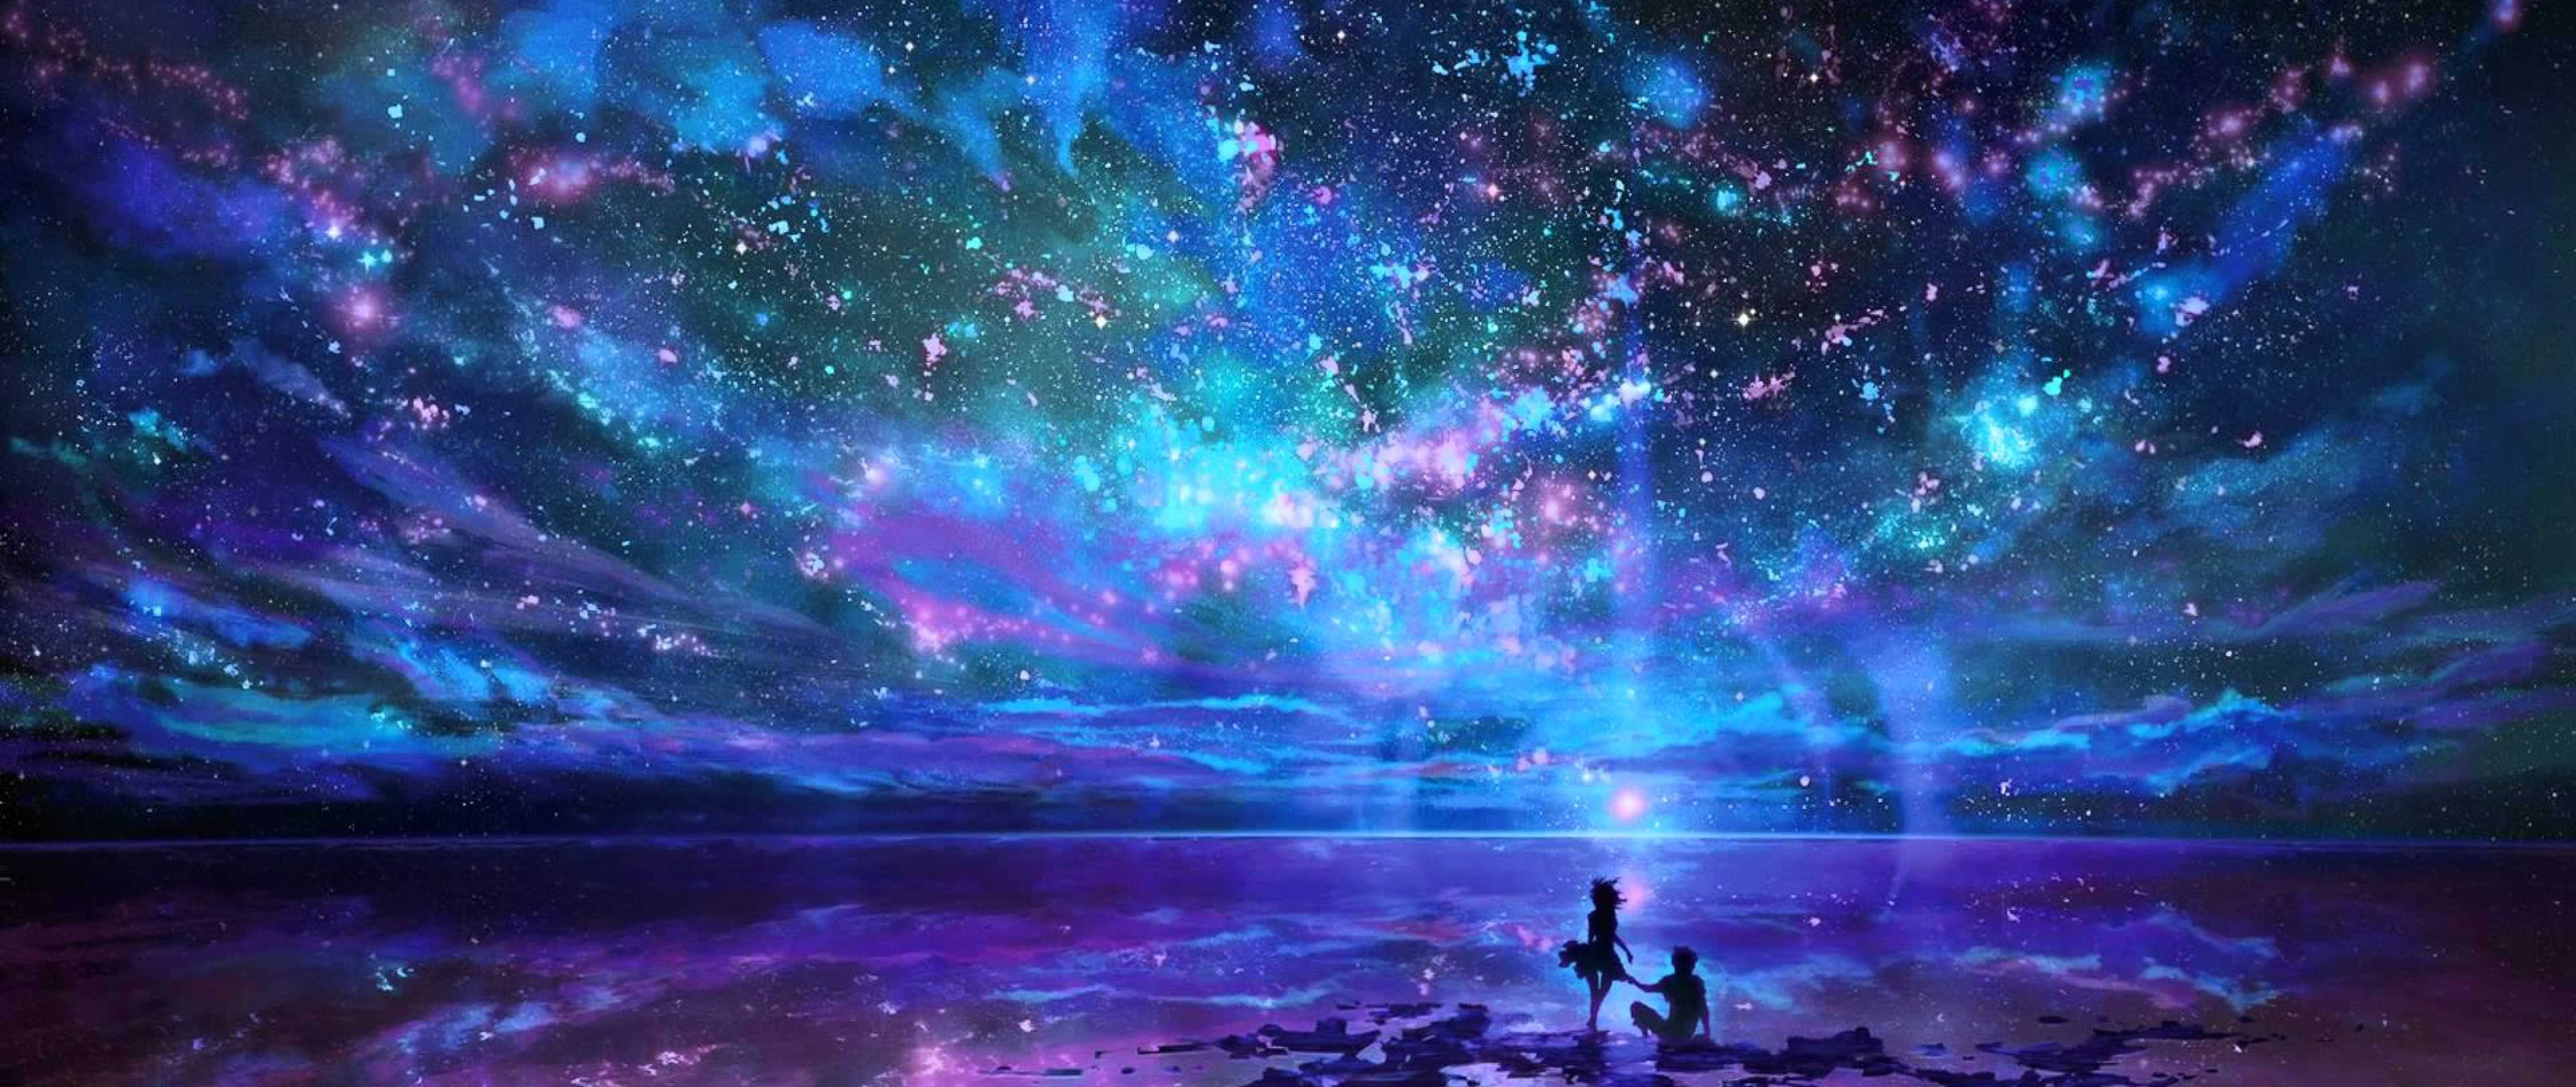 Dreams Of A Fantasy World 4k Hd Desktop Wallpaper For 4k: Free Download HD Lovers In Fantasy World Wallpaper 4K